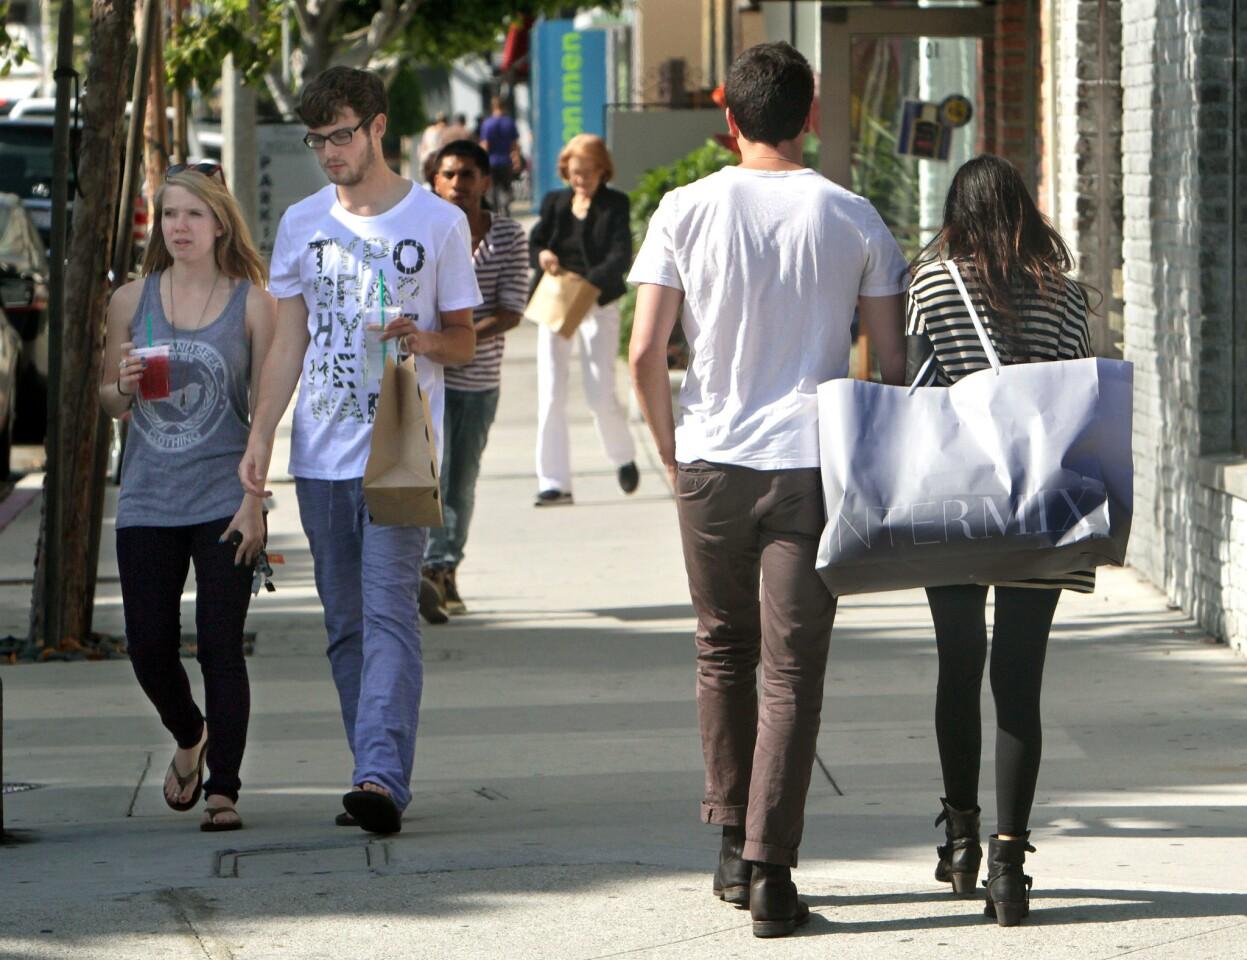 Shoppers near Alden Drive.